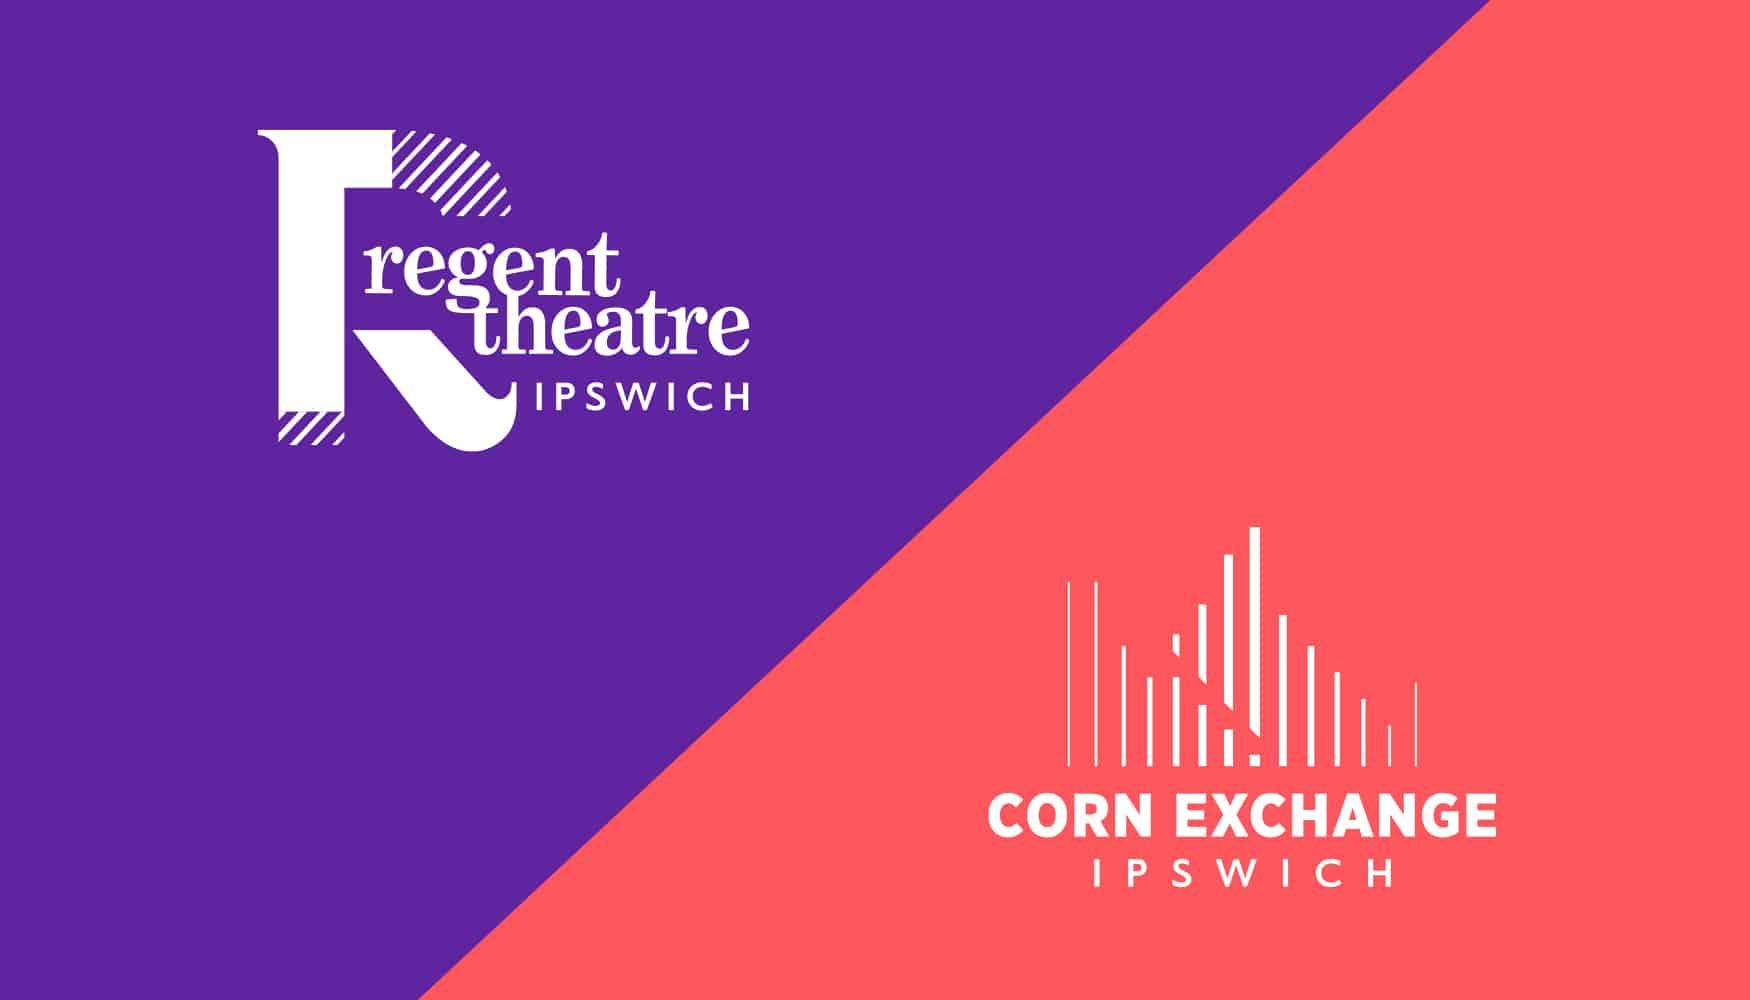 Ipswich Theatres rebrand identities